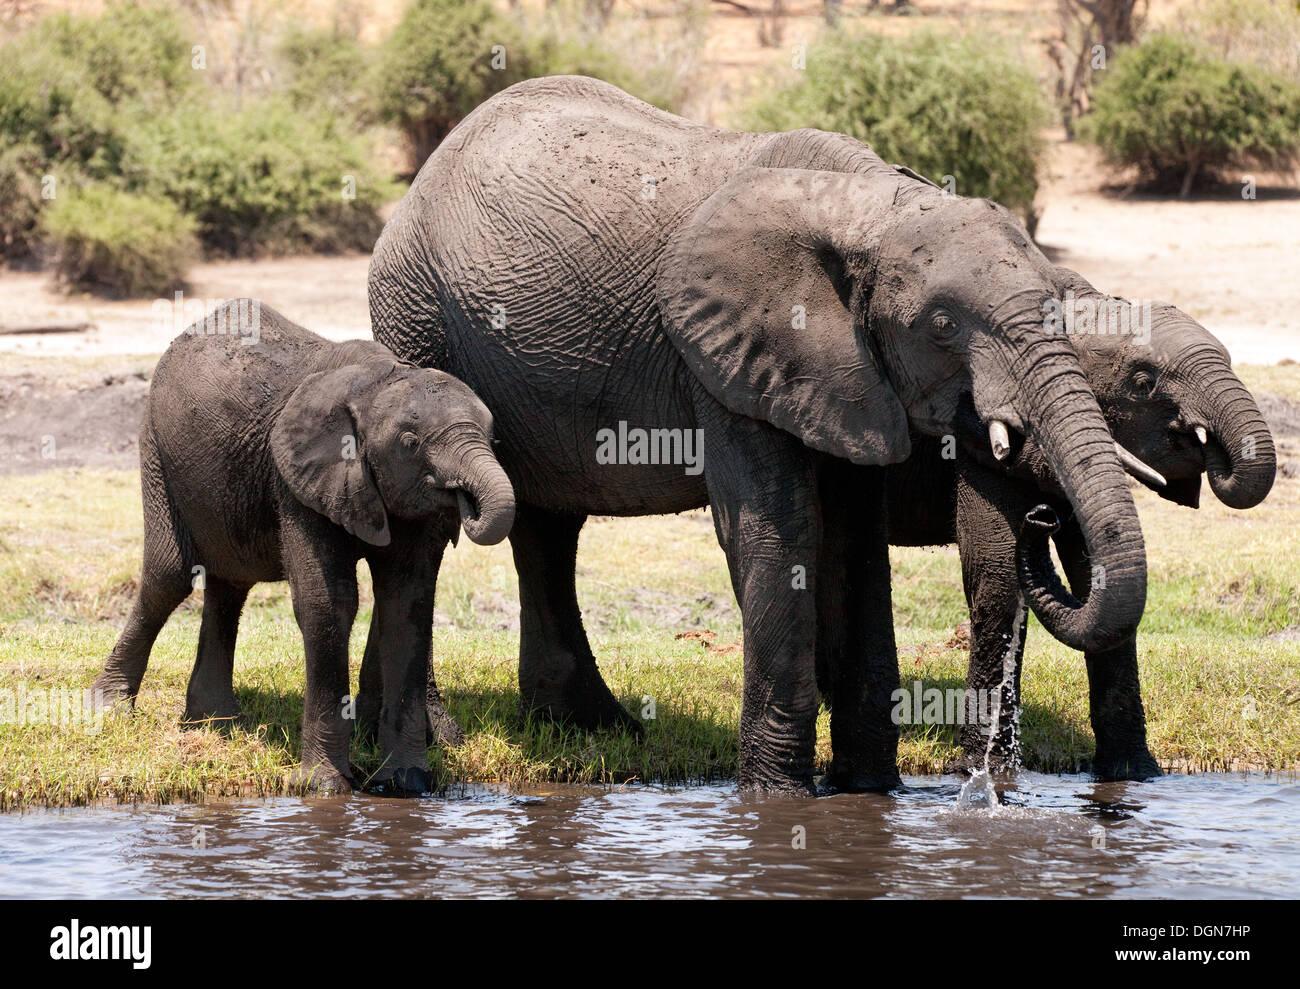 Three african elephants drinking from the Chobe River, Chobe National park, Botswana, Africa - Stock Image